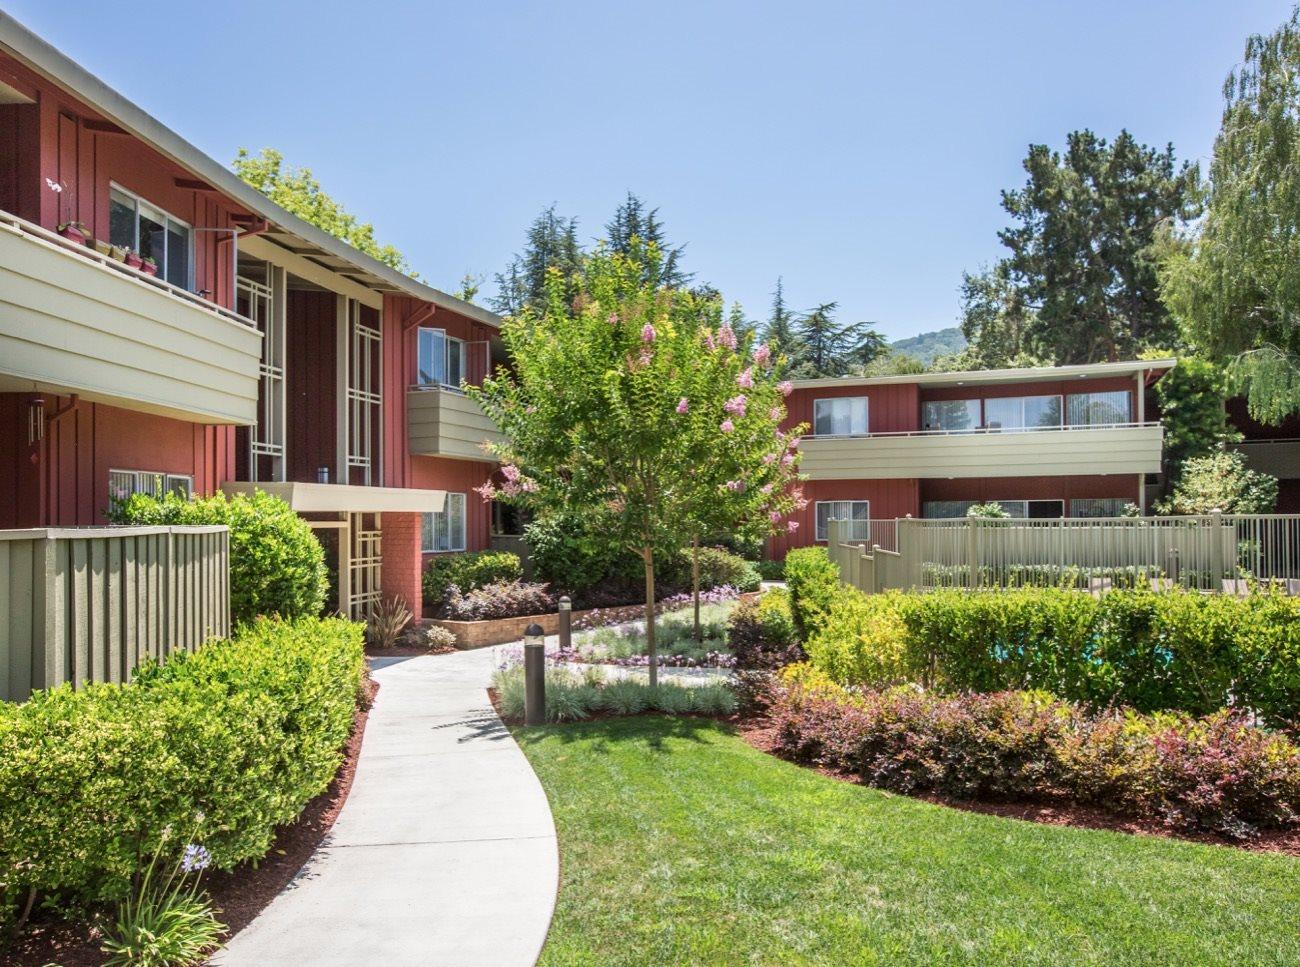 bay-tree-los-gatos-apartments-green-courtyard